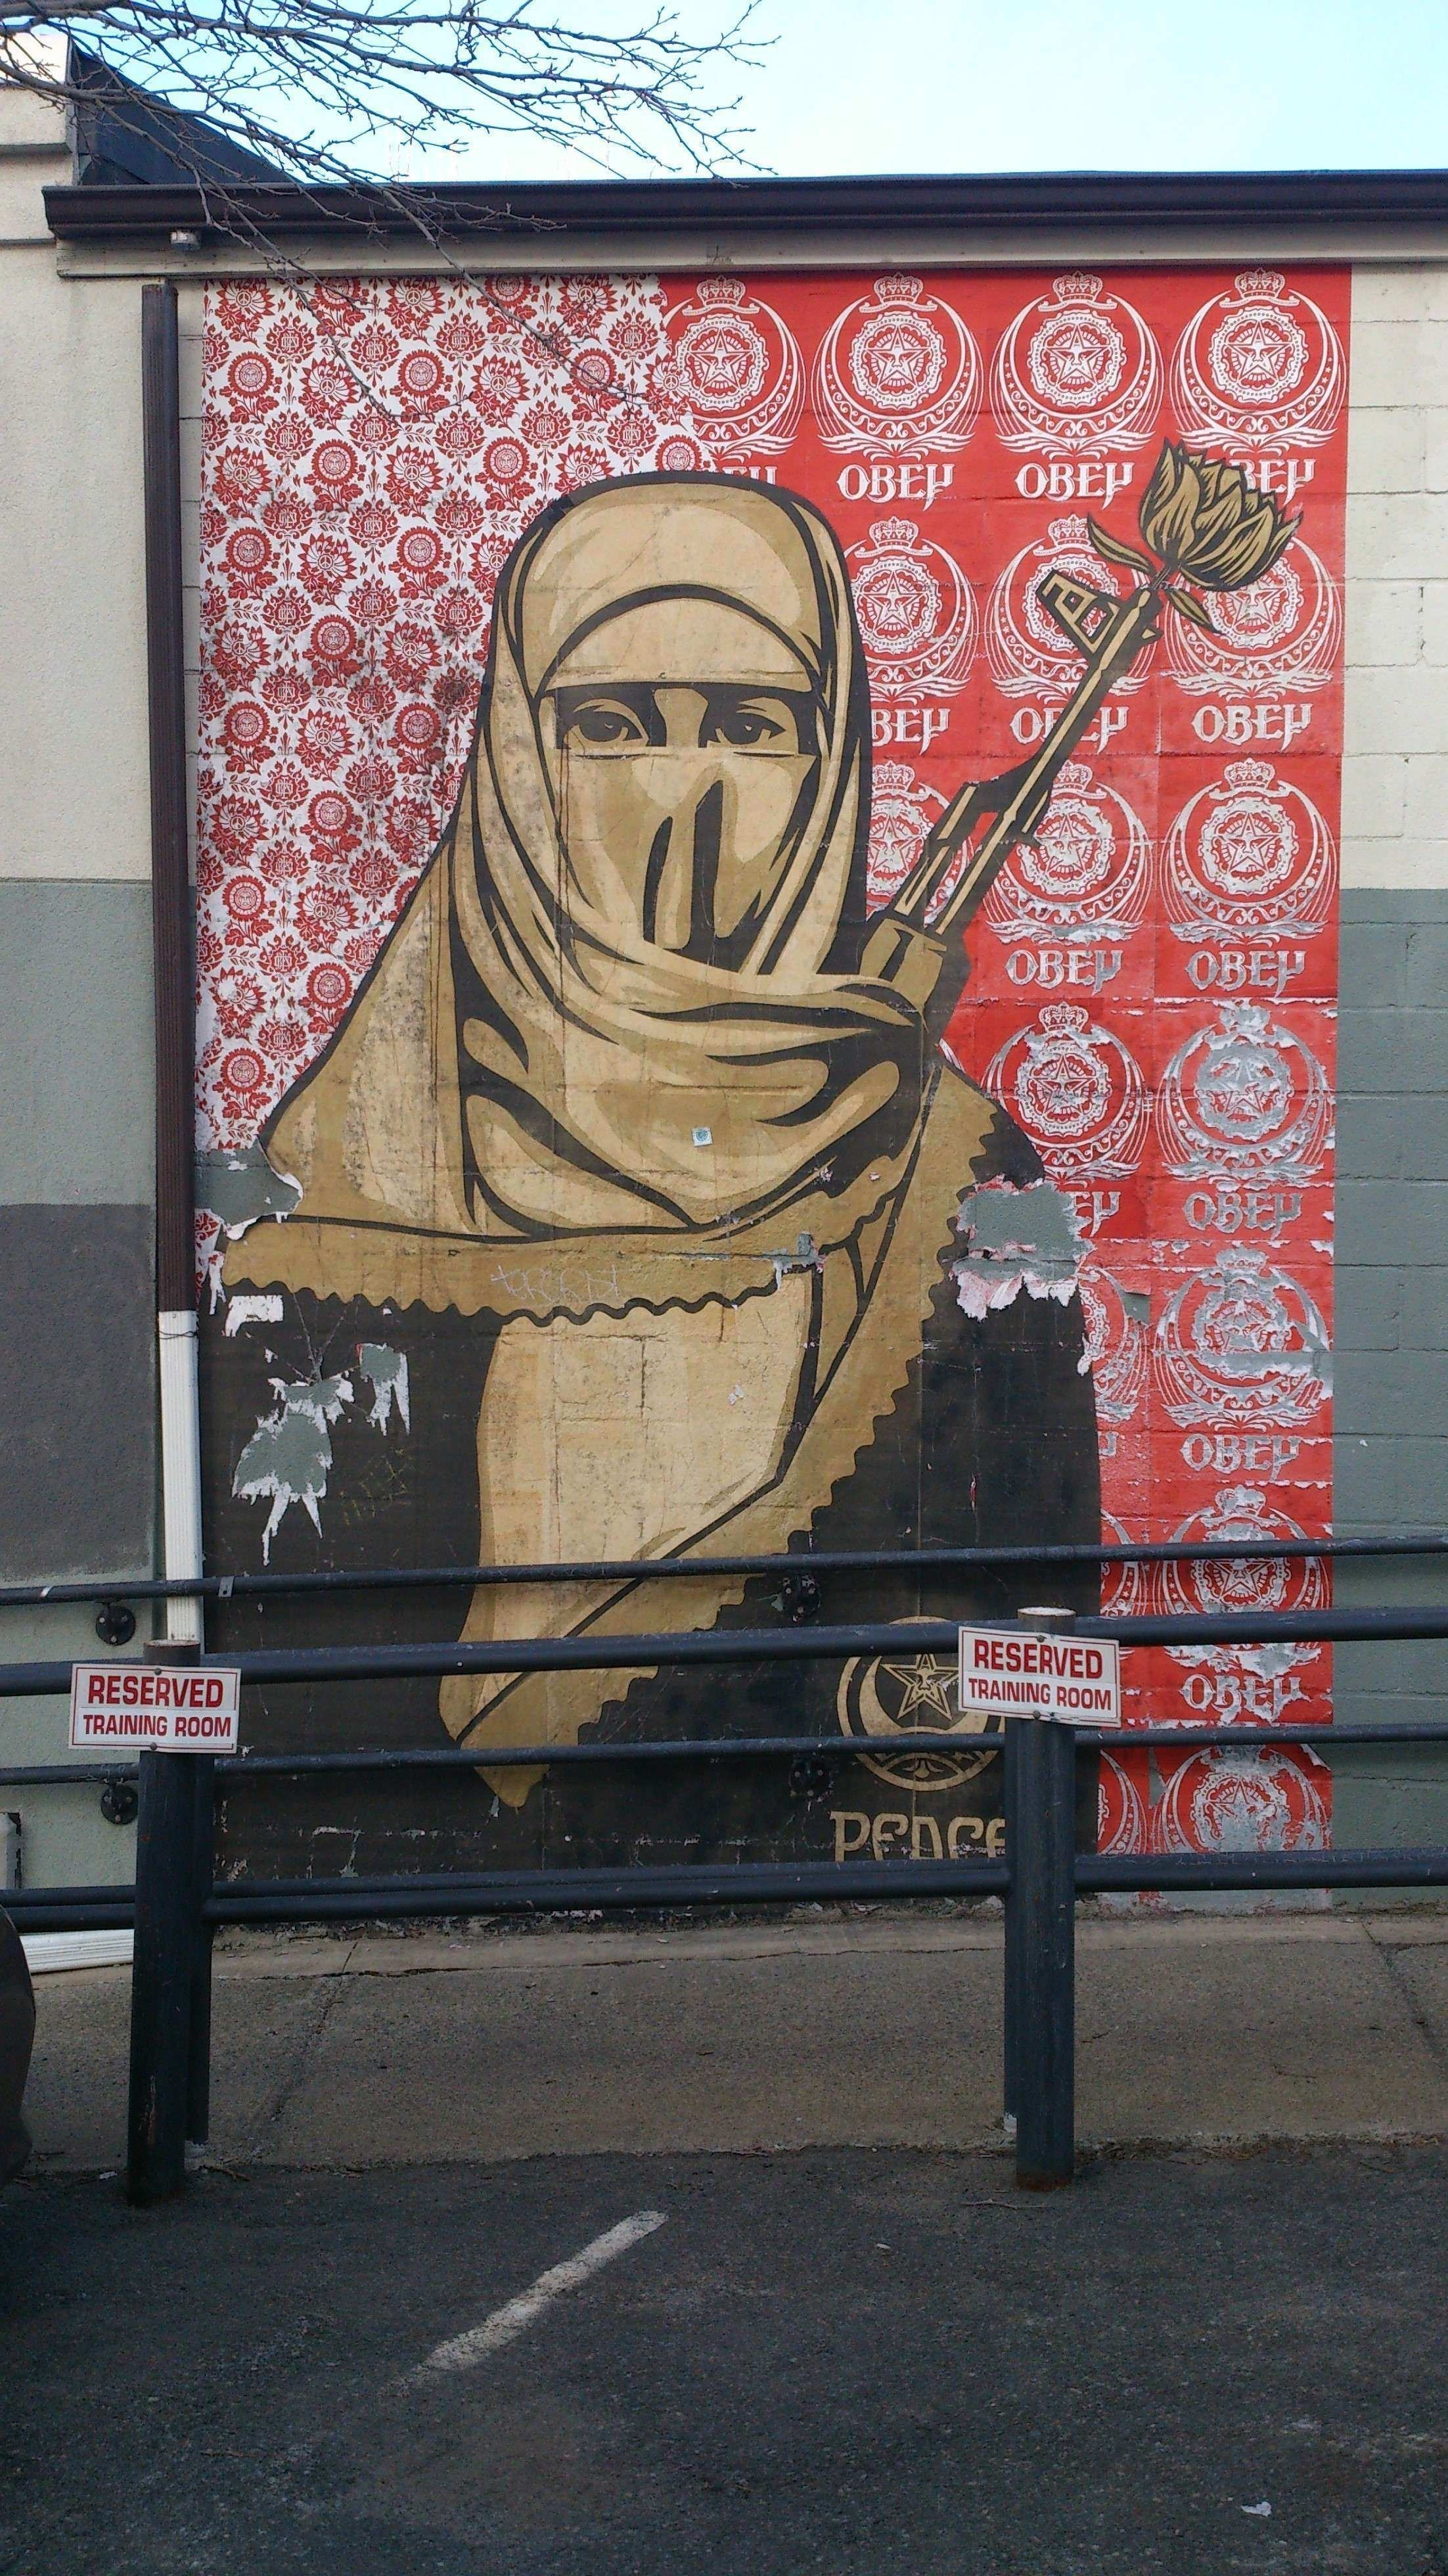 Boston Wall Art Lovely Street Art Wall Art – Boston Area | Wall Art In Latest Boston Wall Art (Gallery 10 of 20)